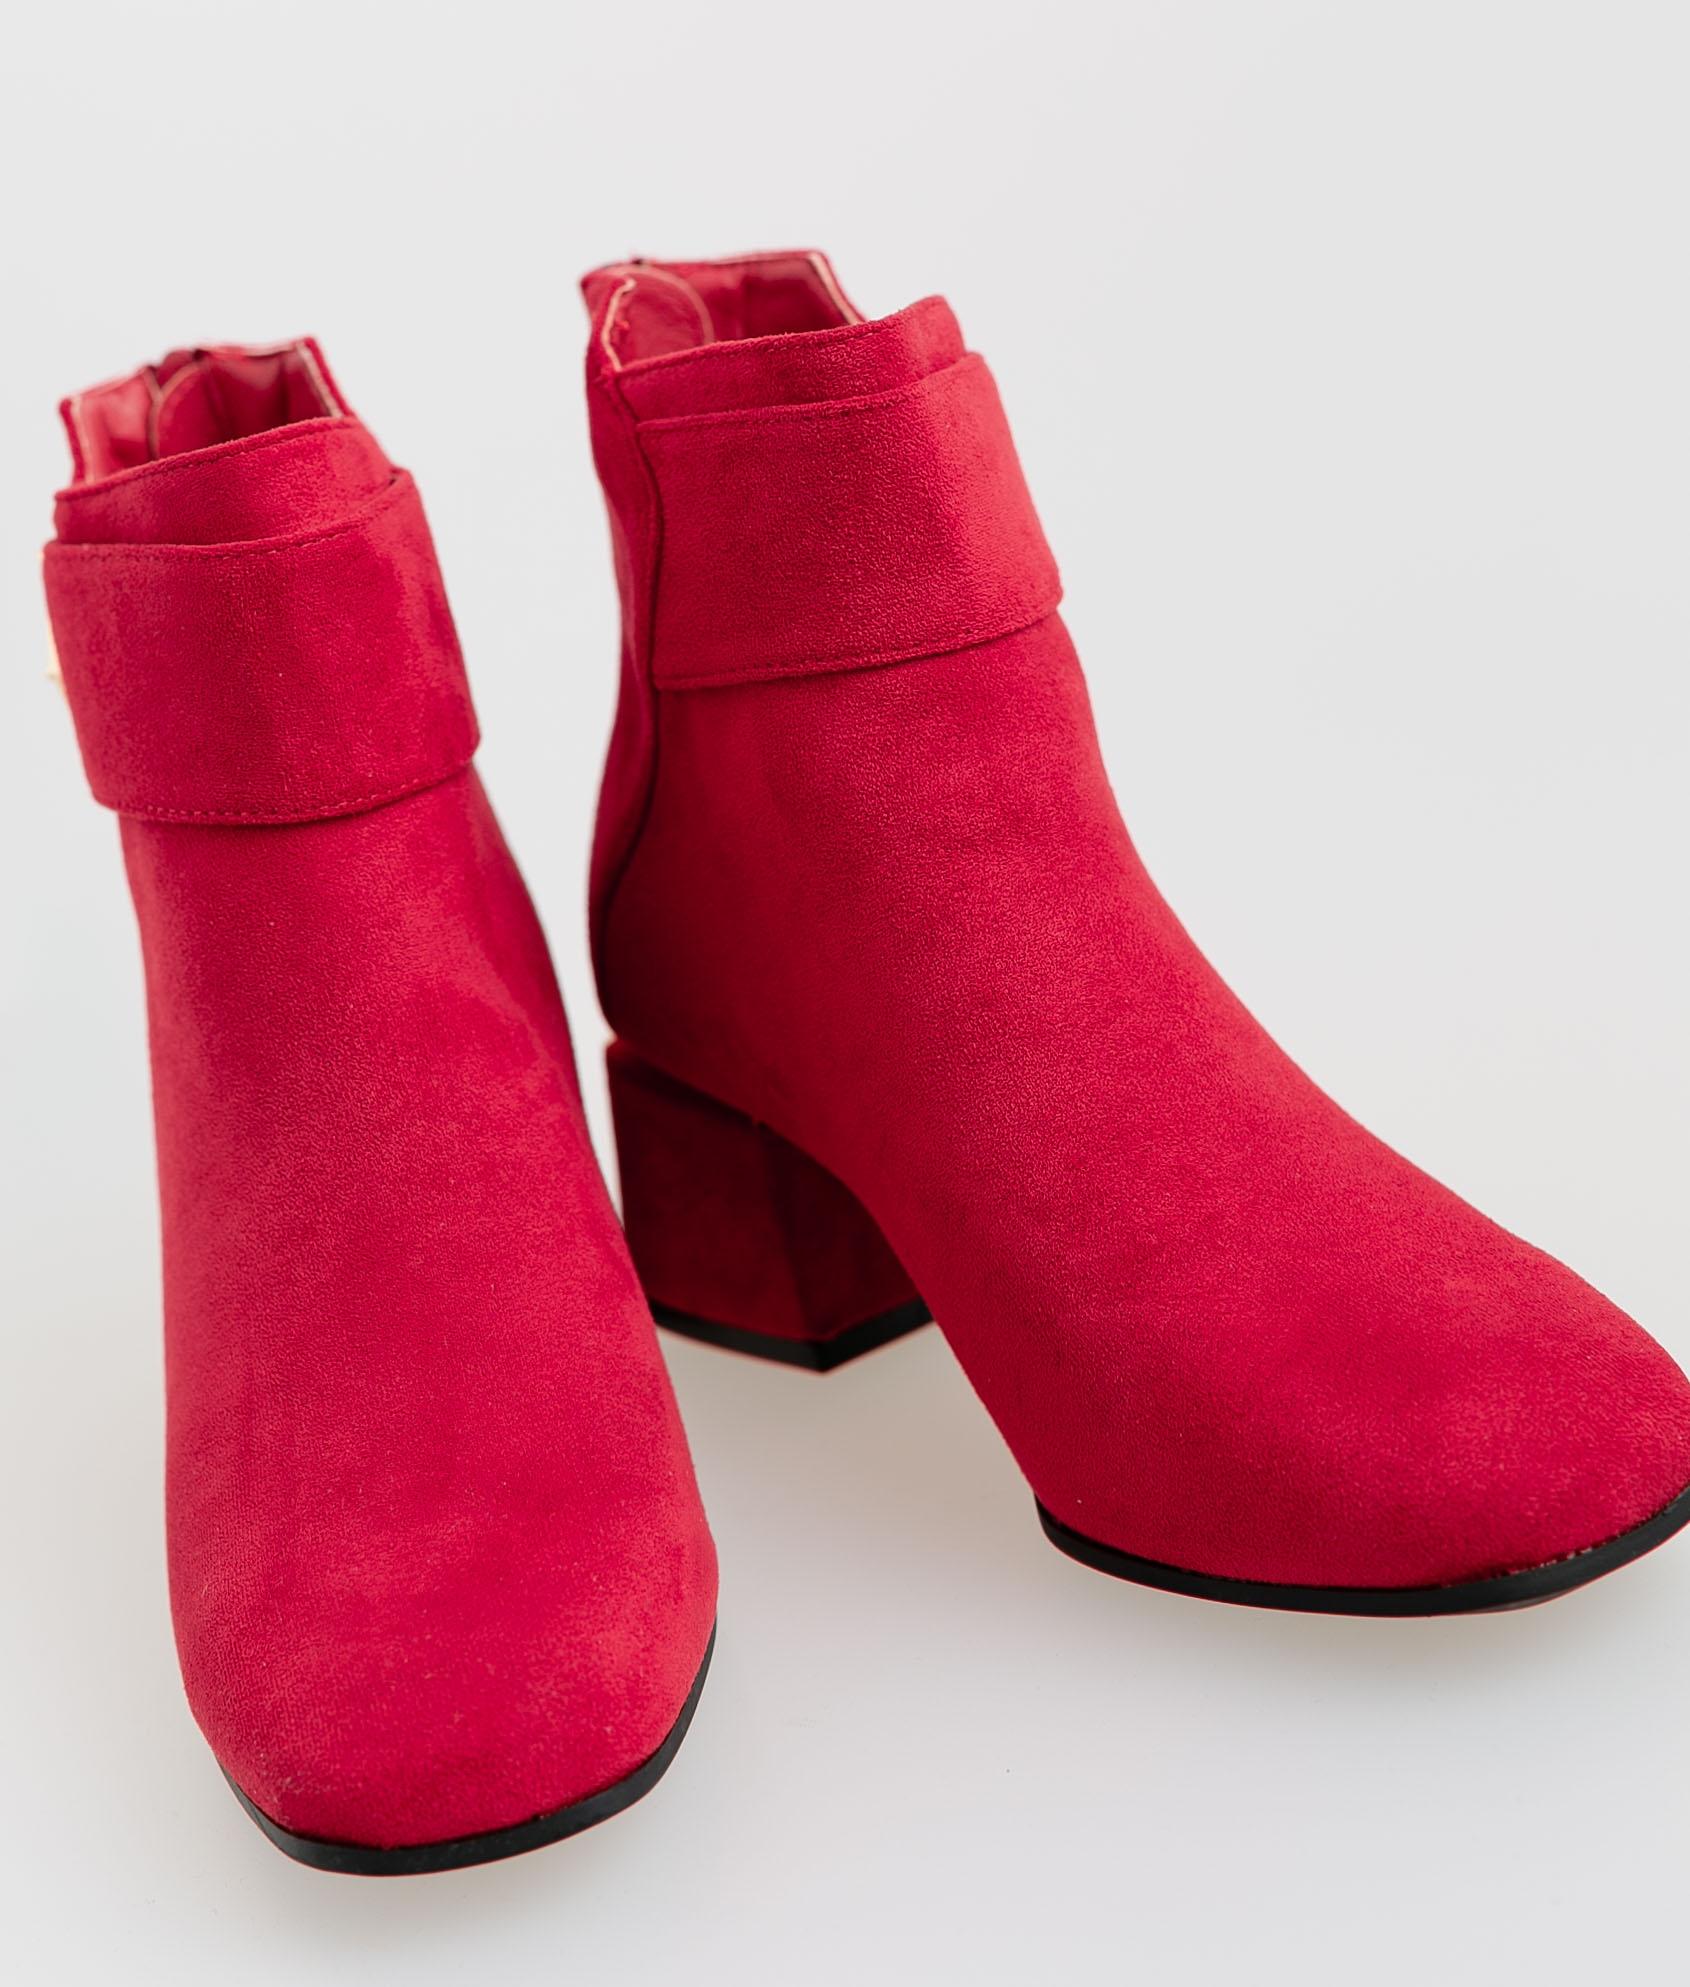 Bota Baja Morgan - Rojo